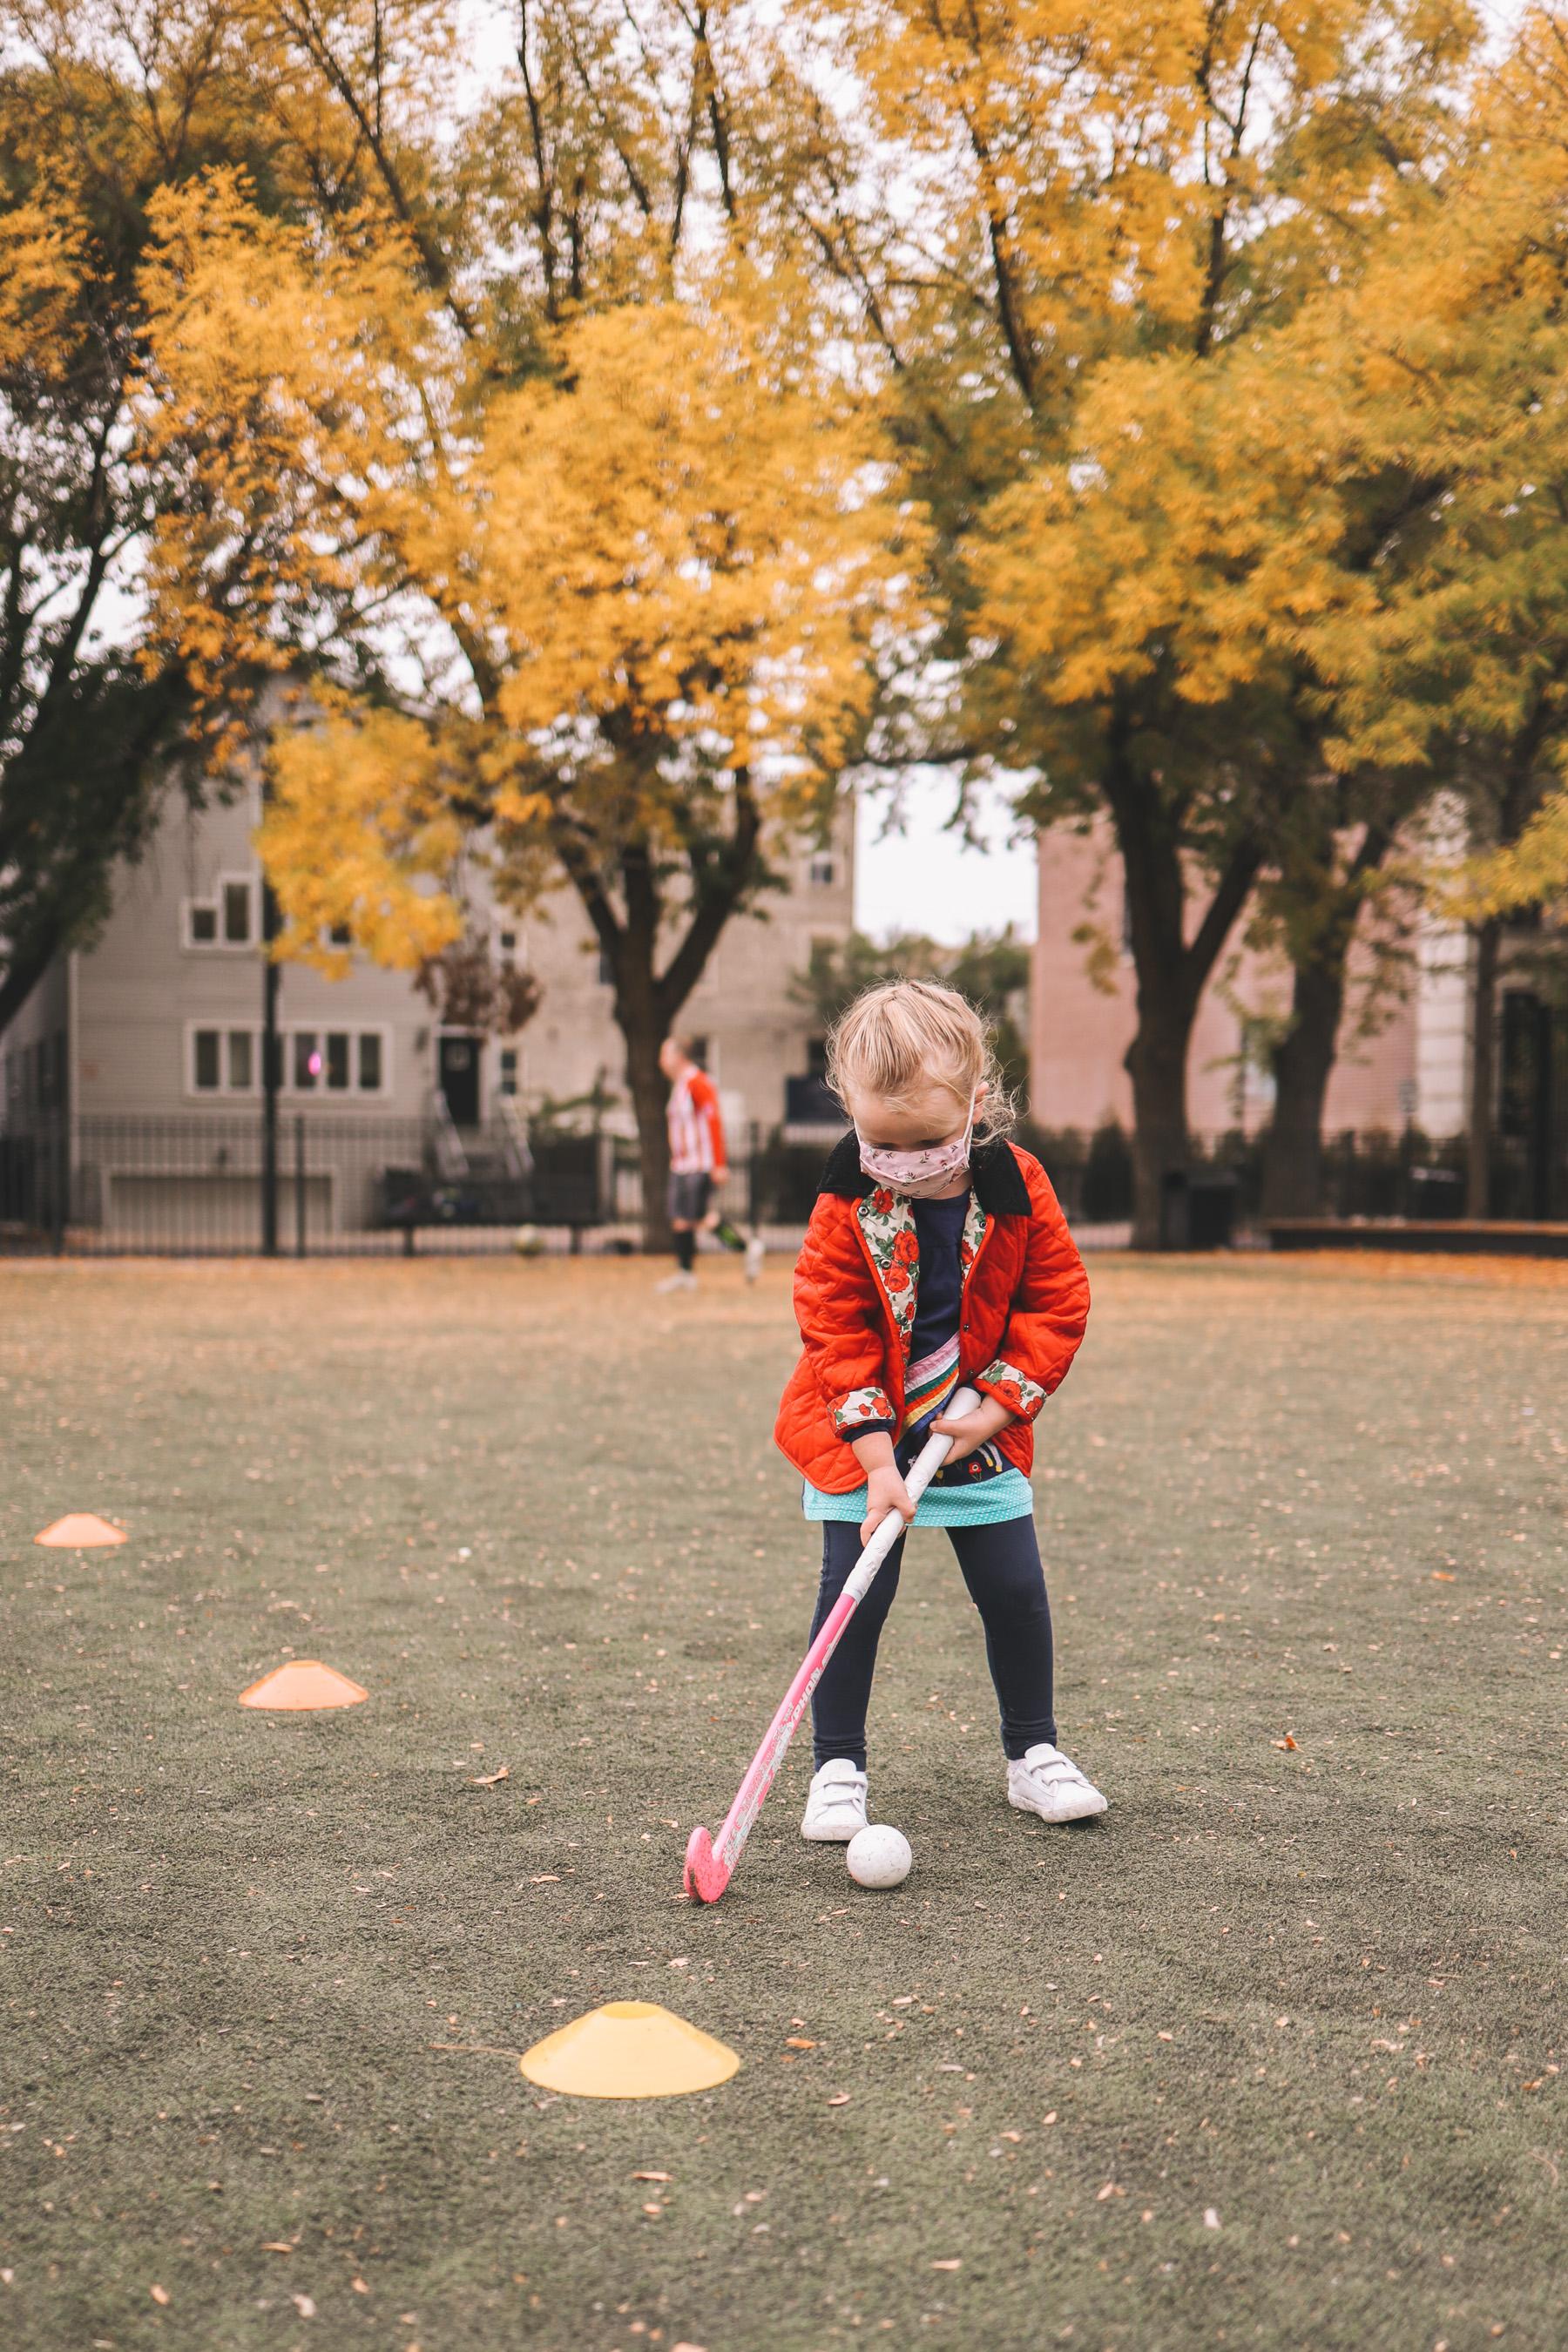 Did You Play Field Hockey